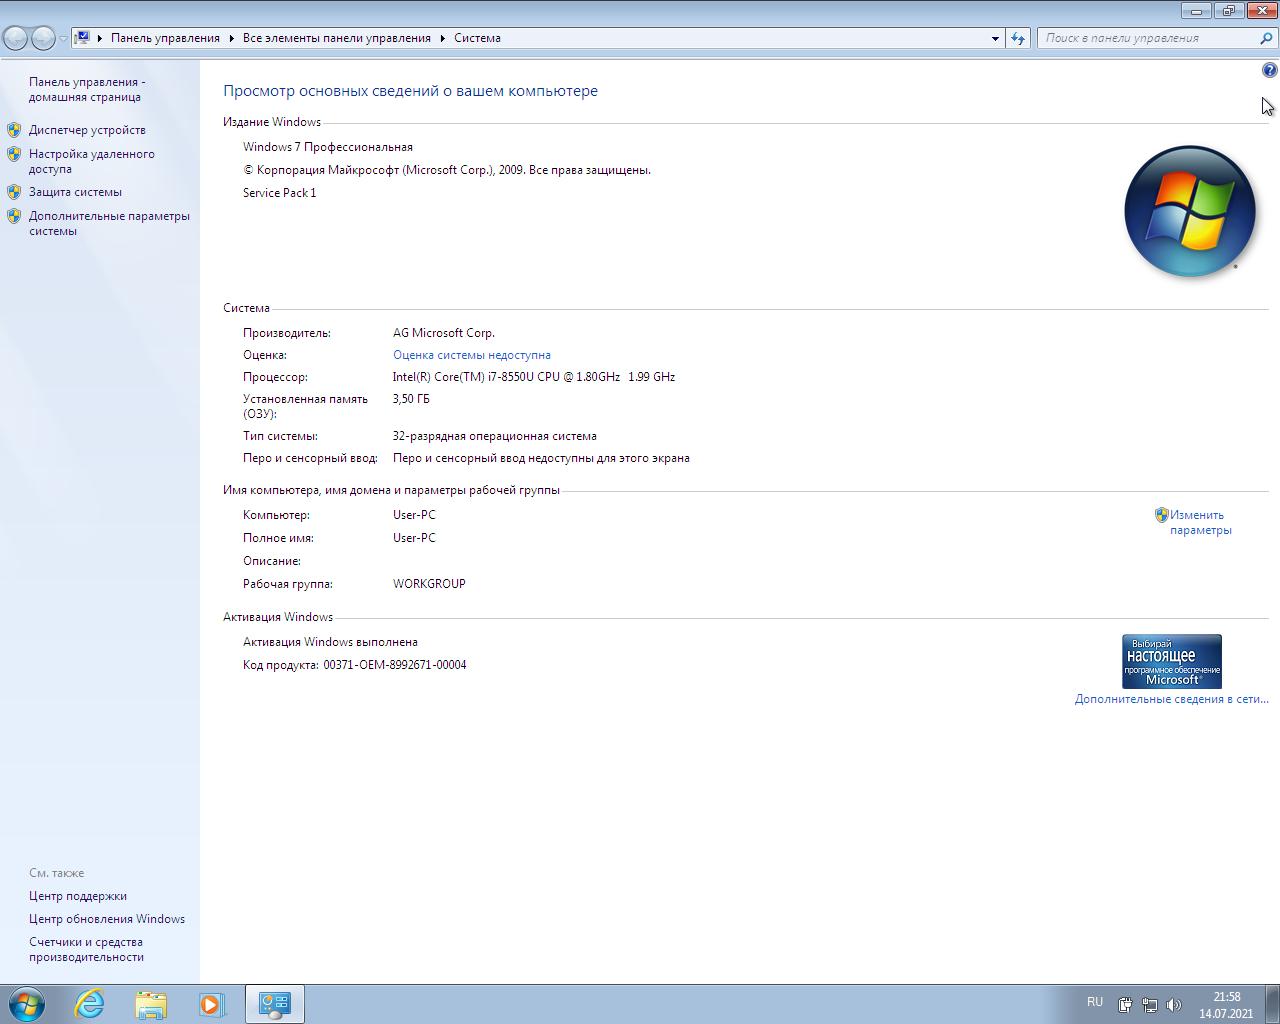 Windows 7 x64-x86 5in1 WPI & USB 3.0 + M.2 NVMe by AG 07.2021